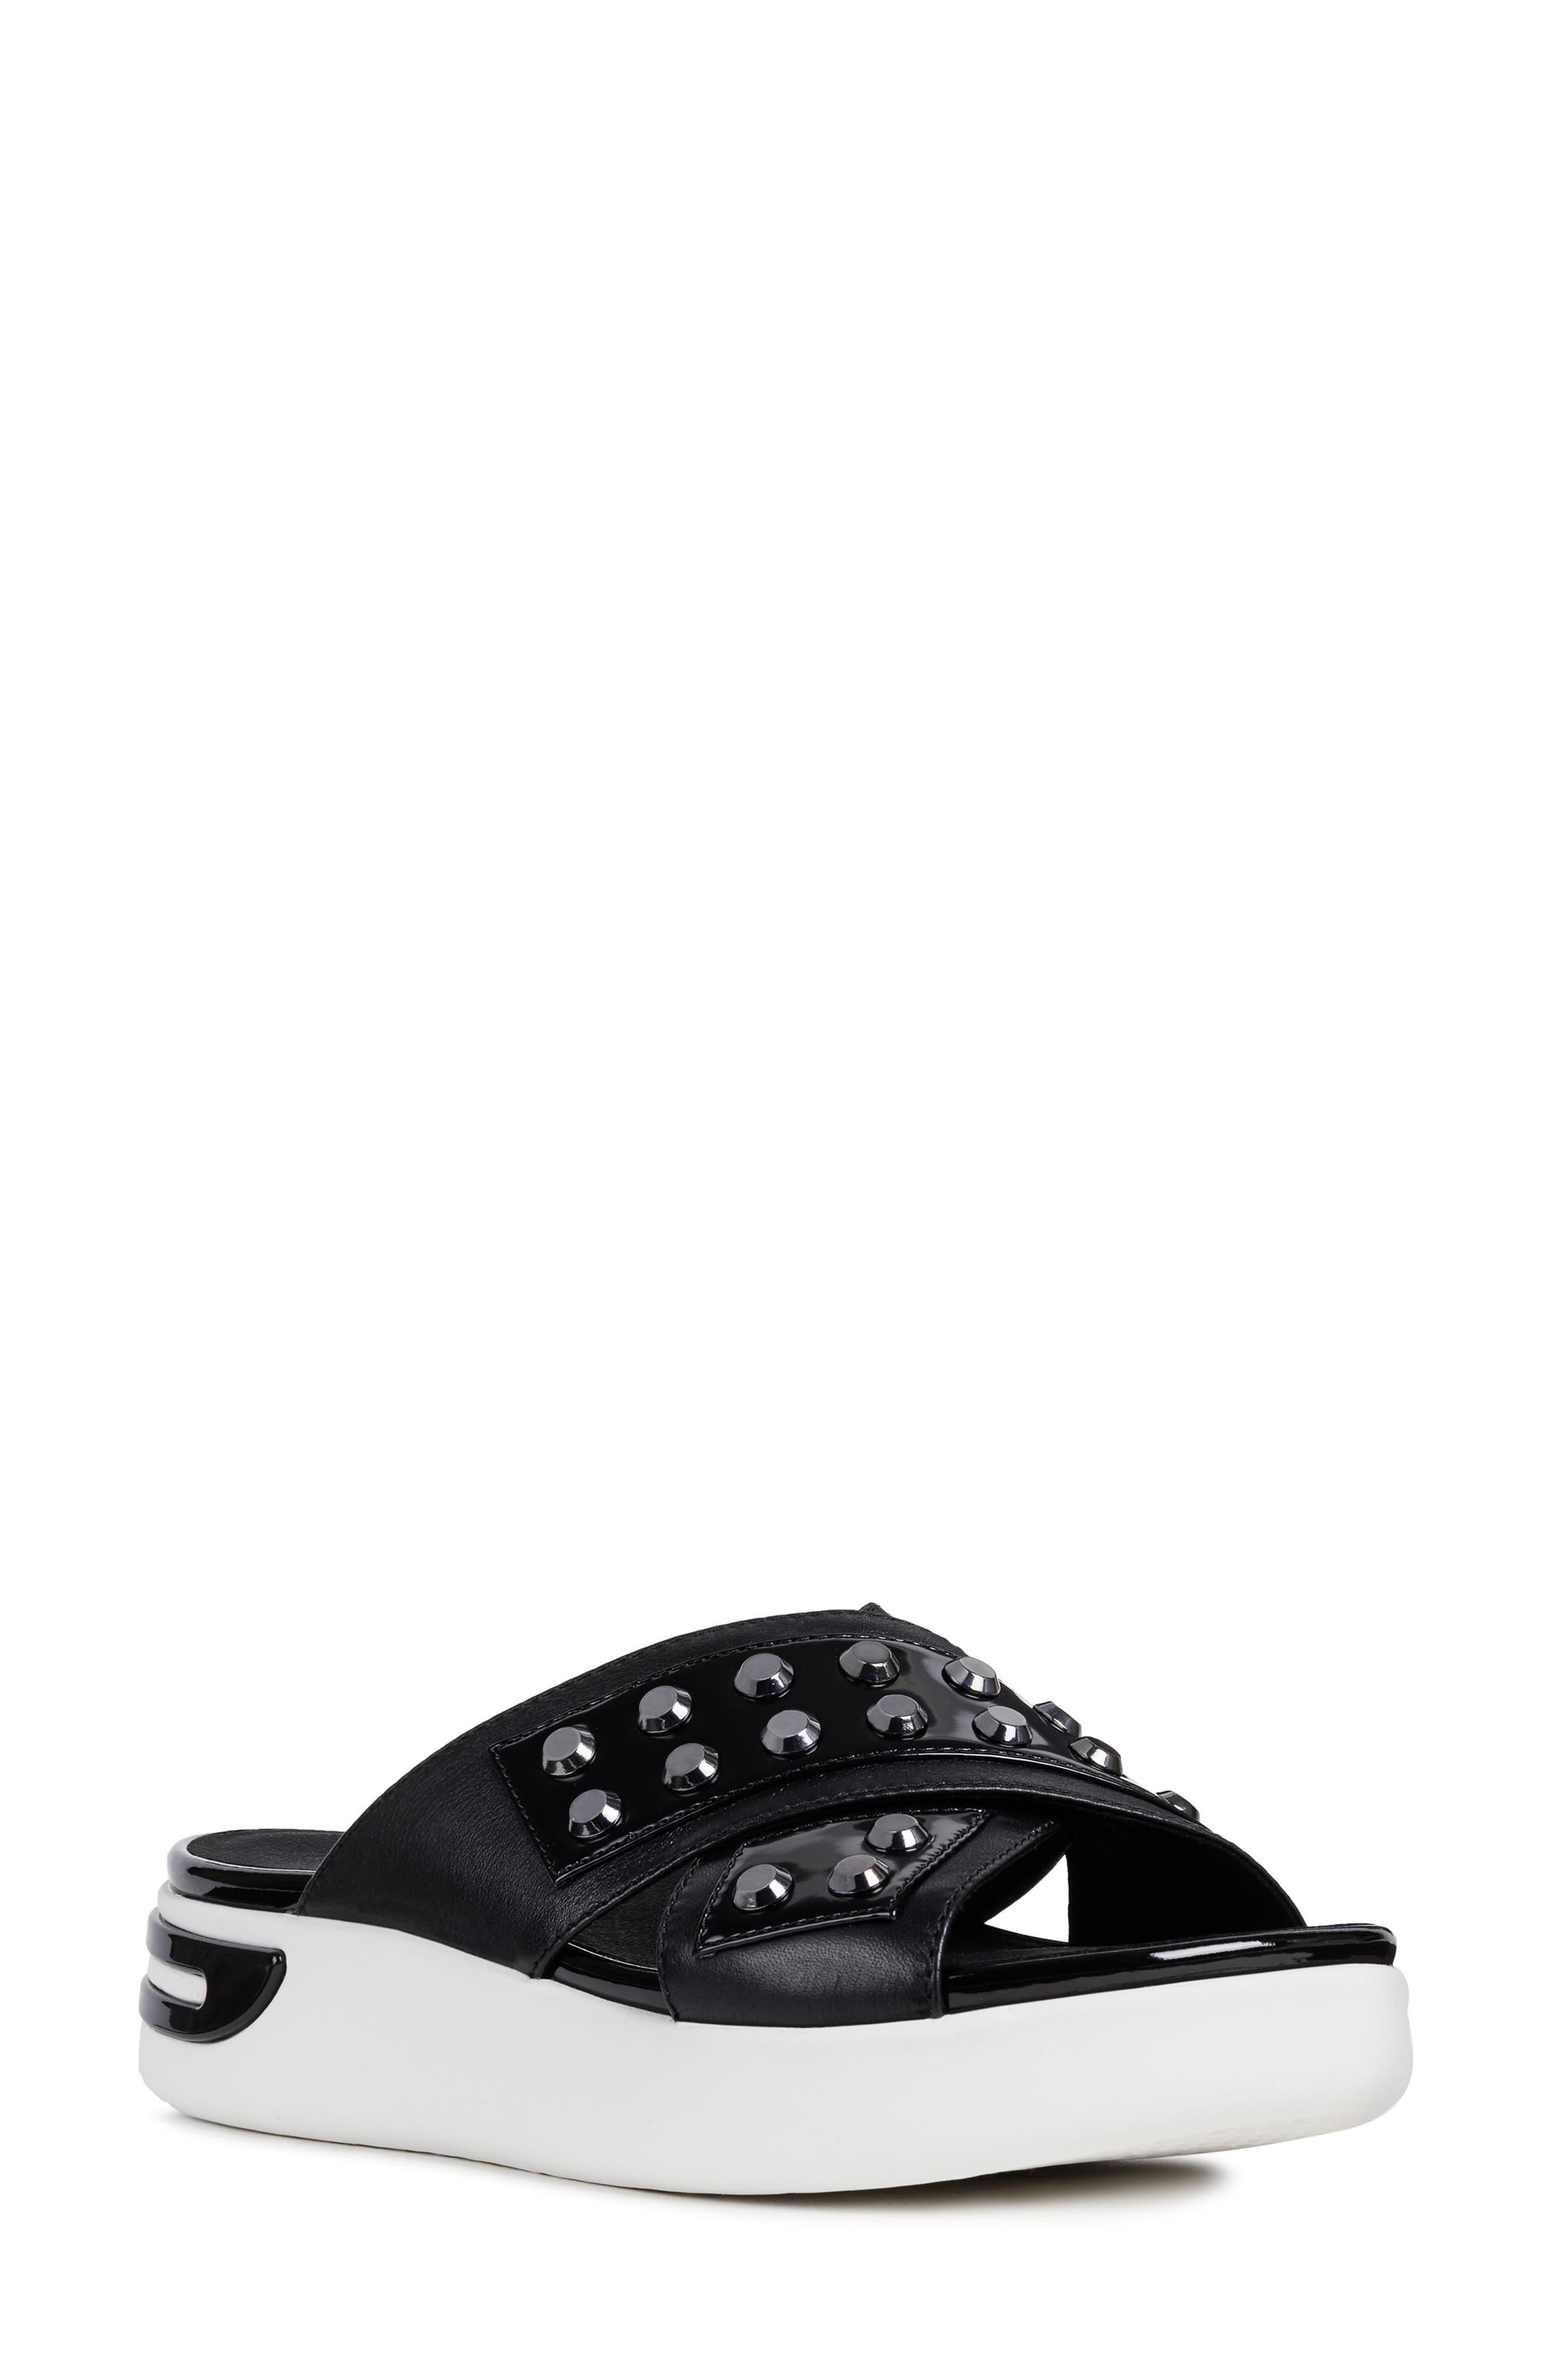 GEOX, Ottaya Studded Slide Sandal, Main thumbnail 1, color, BLACK LEATHER